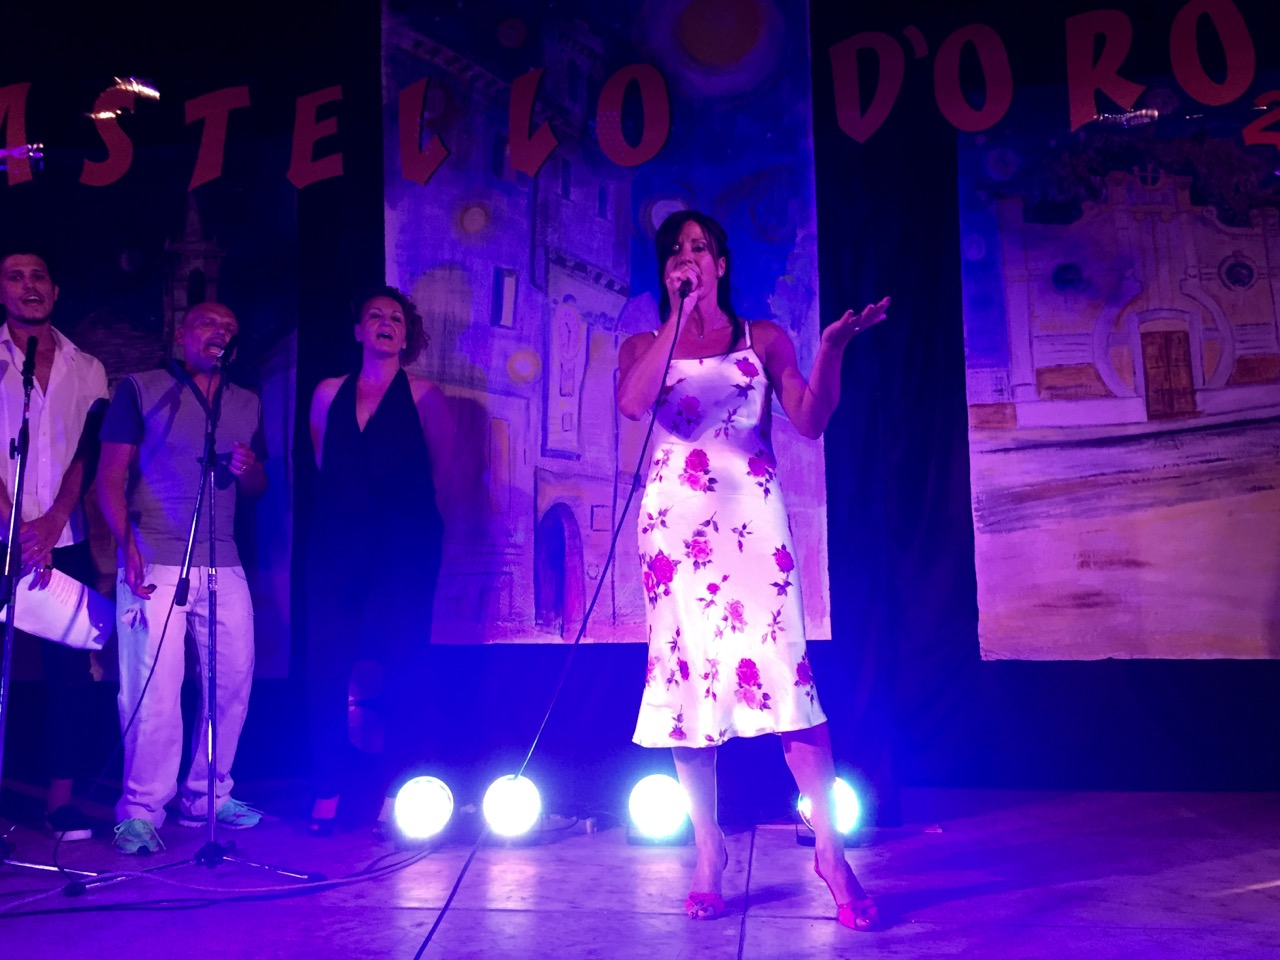 16-07-23 CASTELLO D'ORO 2016 - 42.jpg